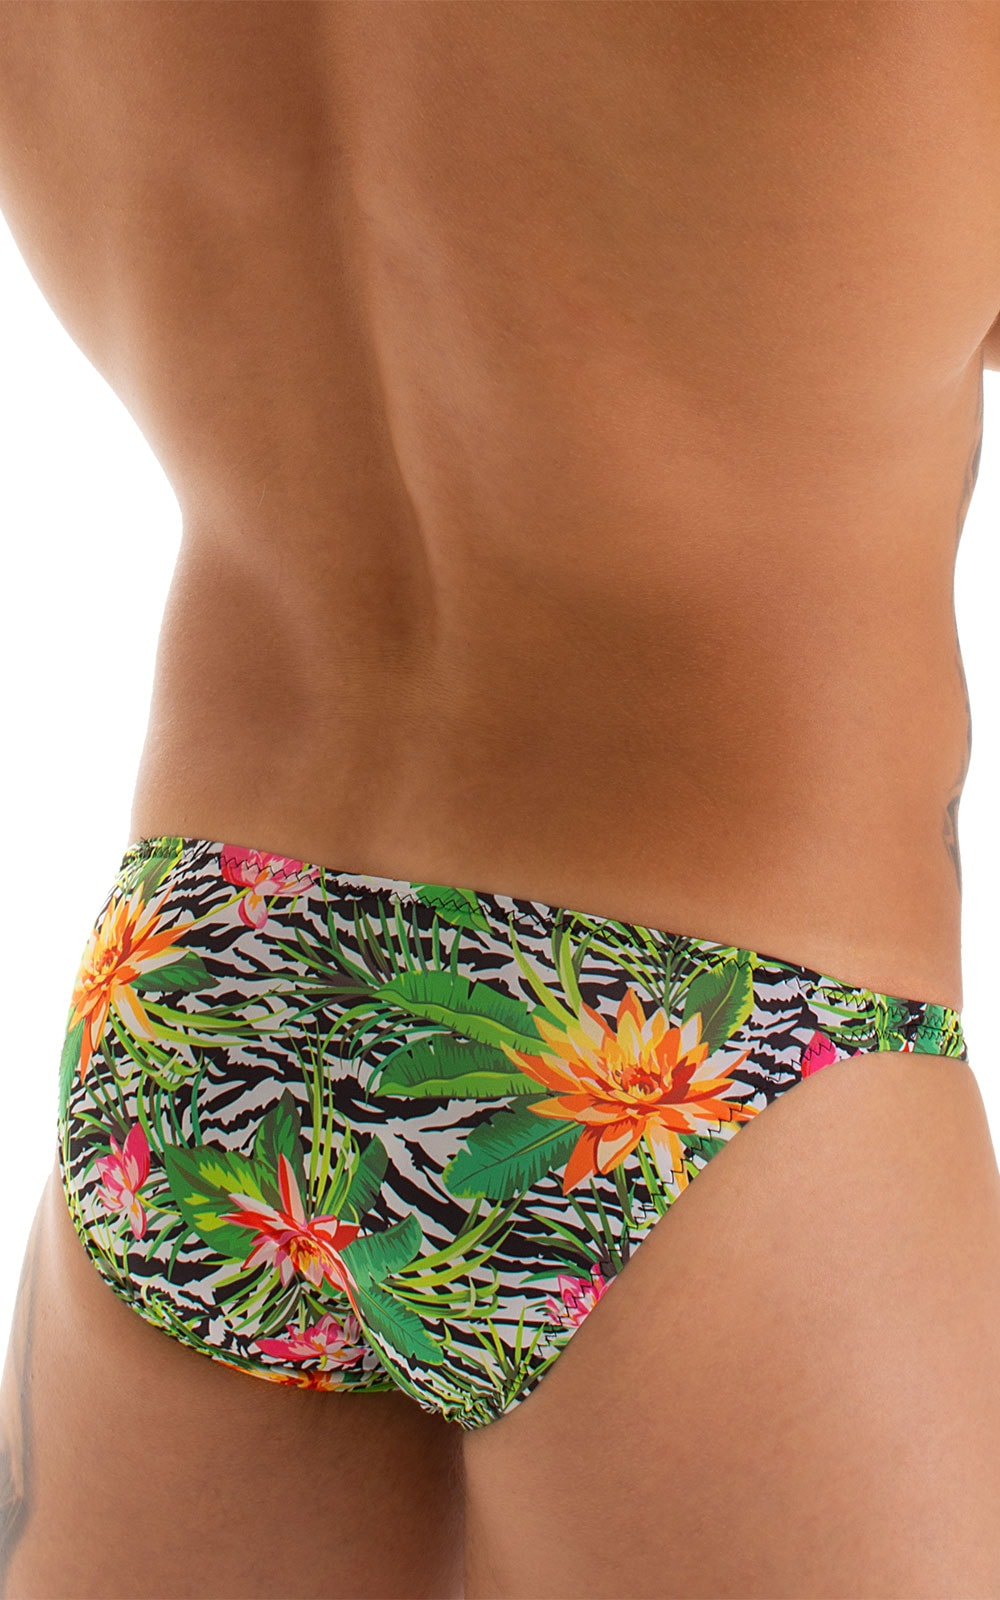 Stuffit Pouch Bikini Swimsuit in Super ThinSKINZ Exotic Tropics 4